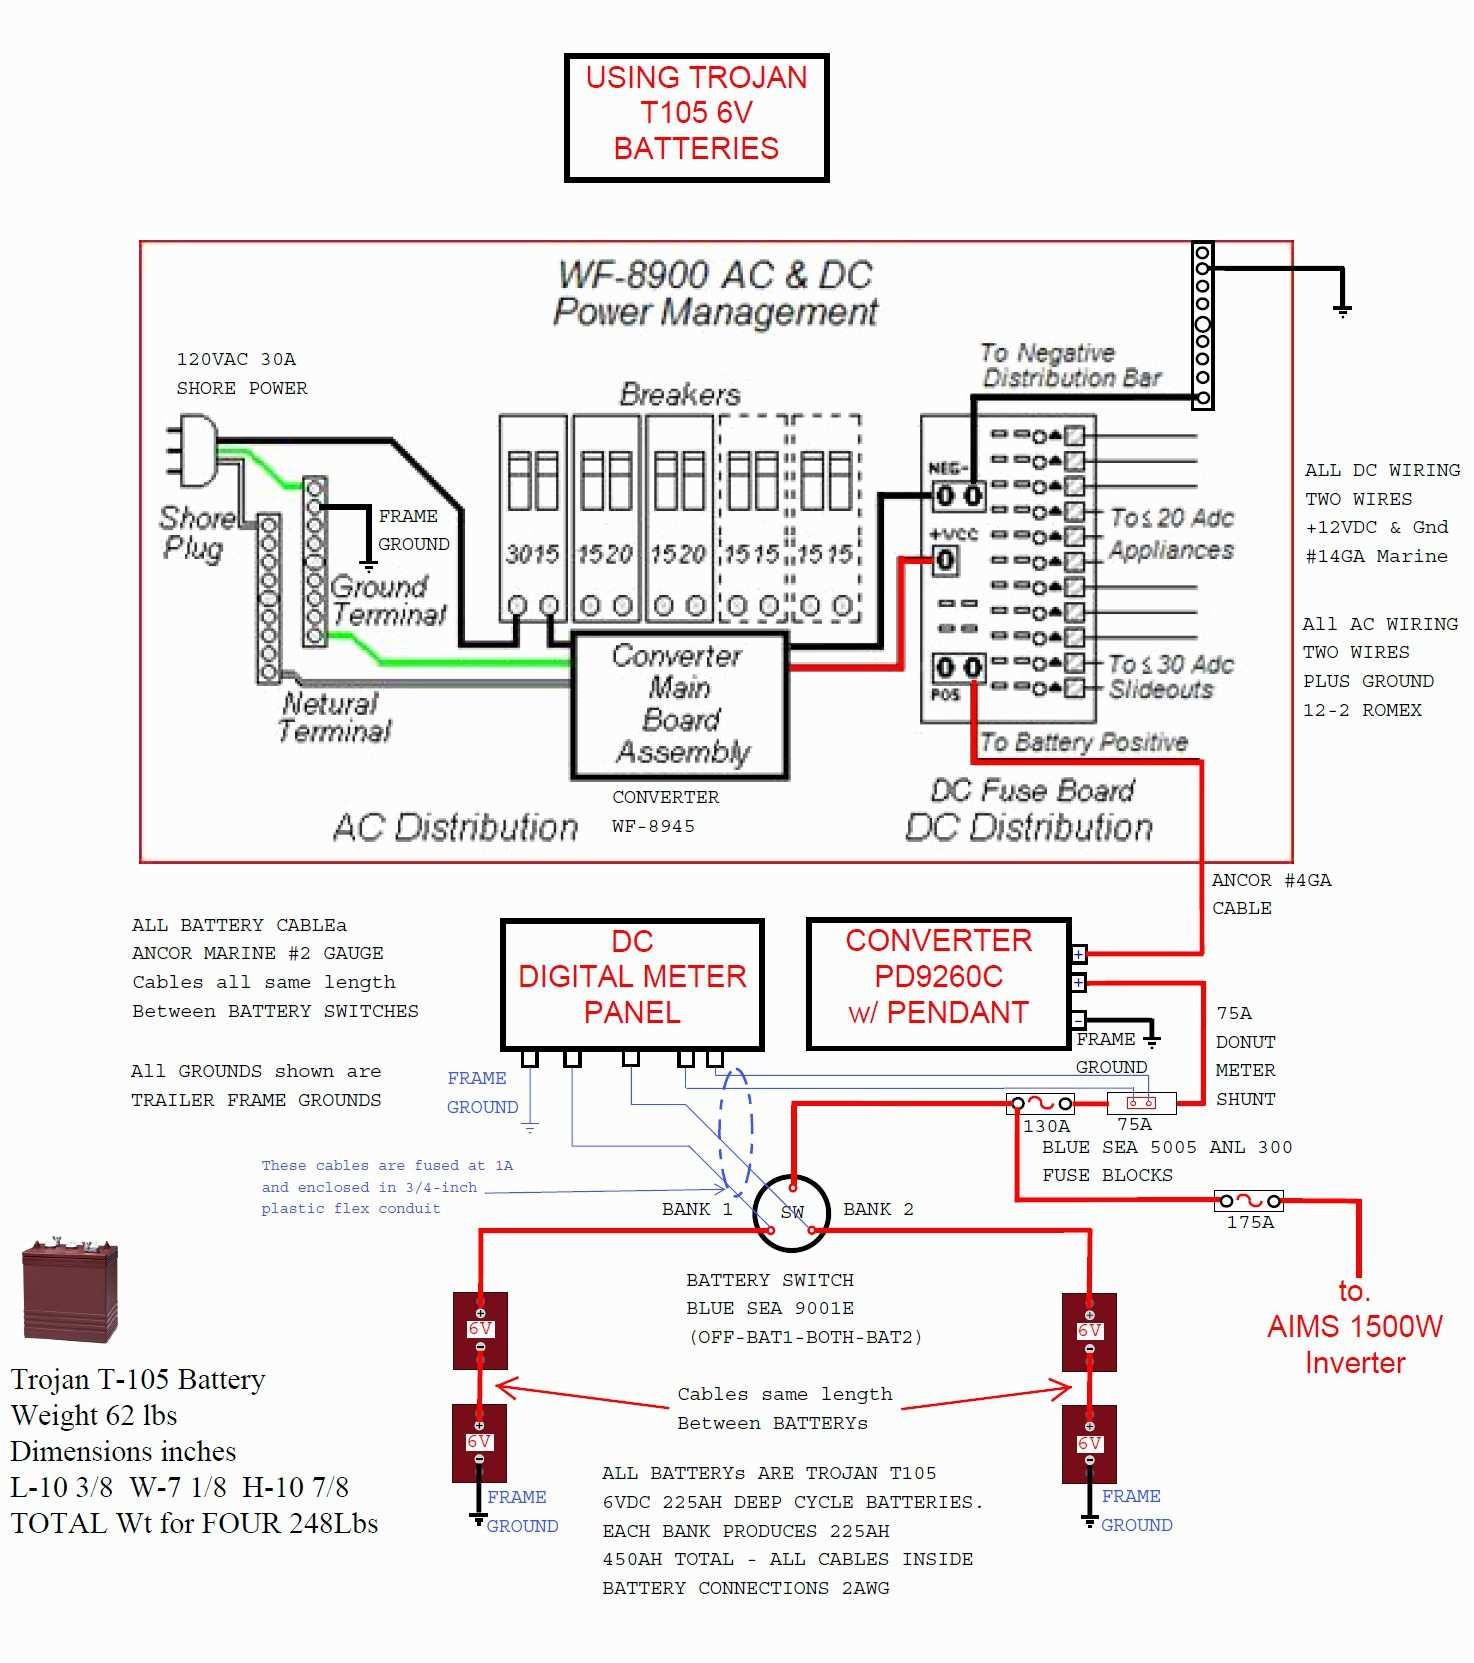 Rv Power Converter Wiring Diagram Simplified Shapes Wiring Diagram - Rv Power Converter Wiring Diagram